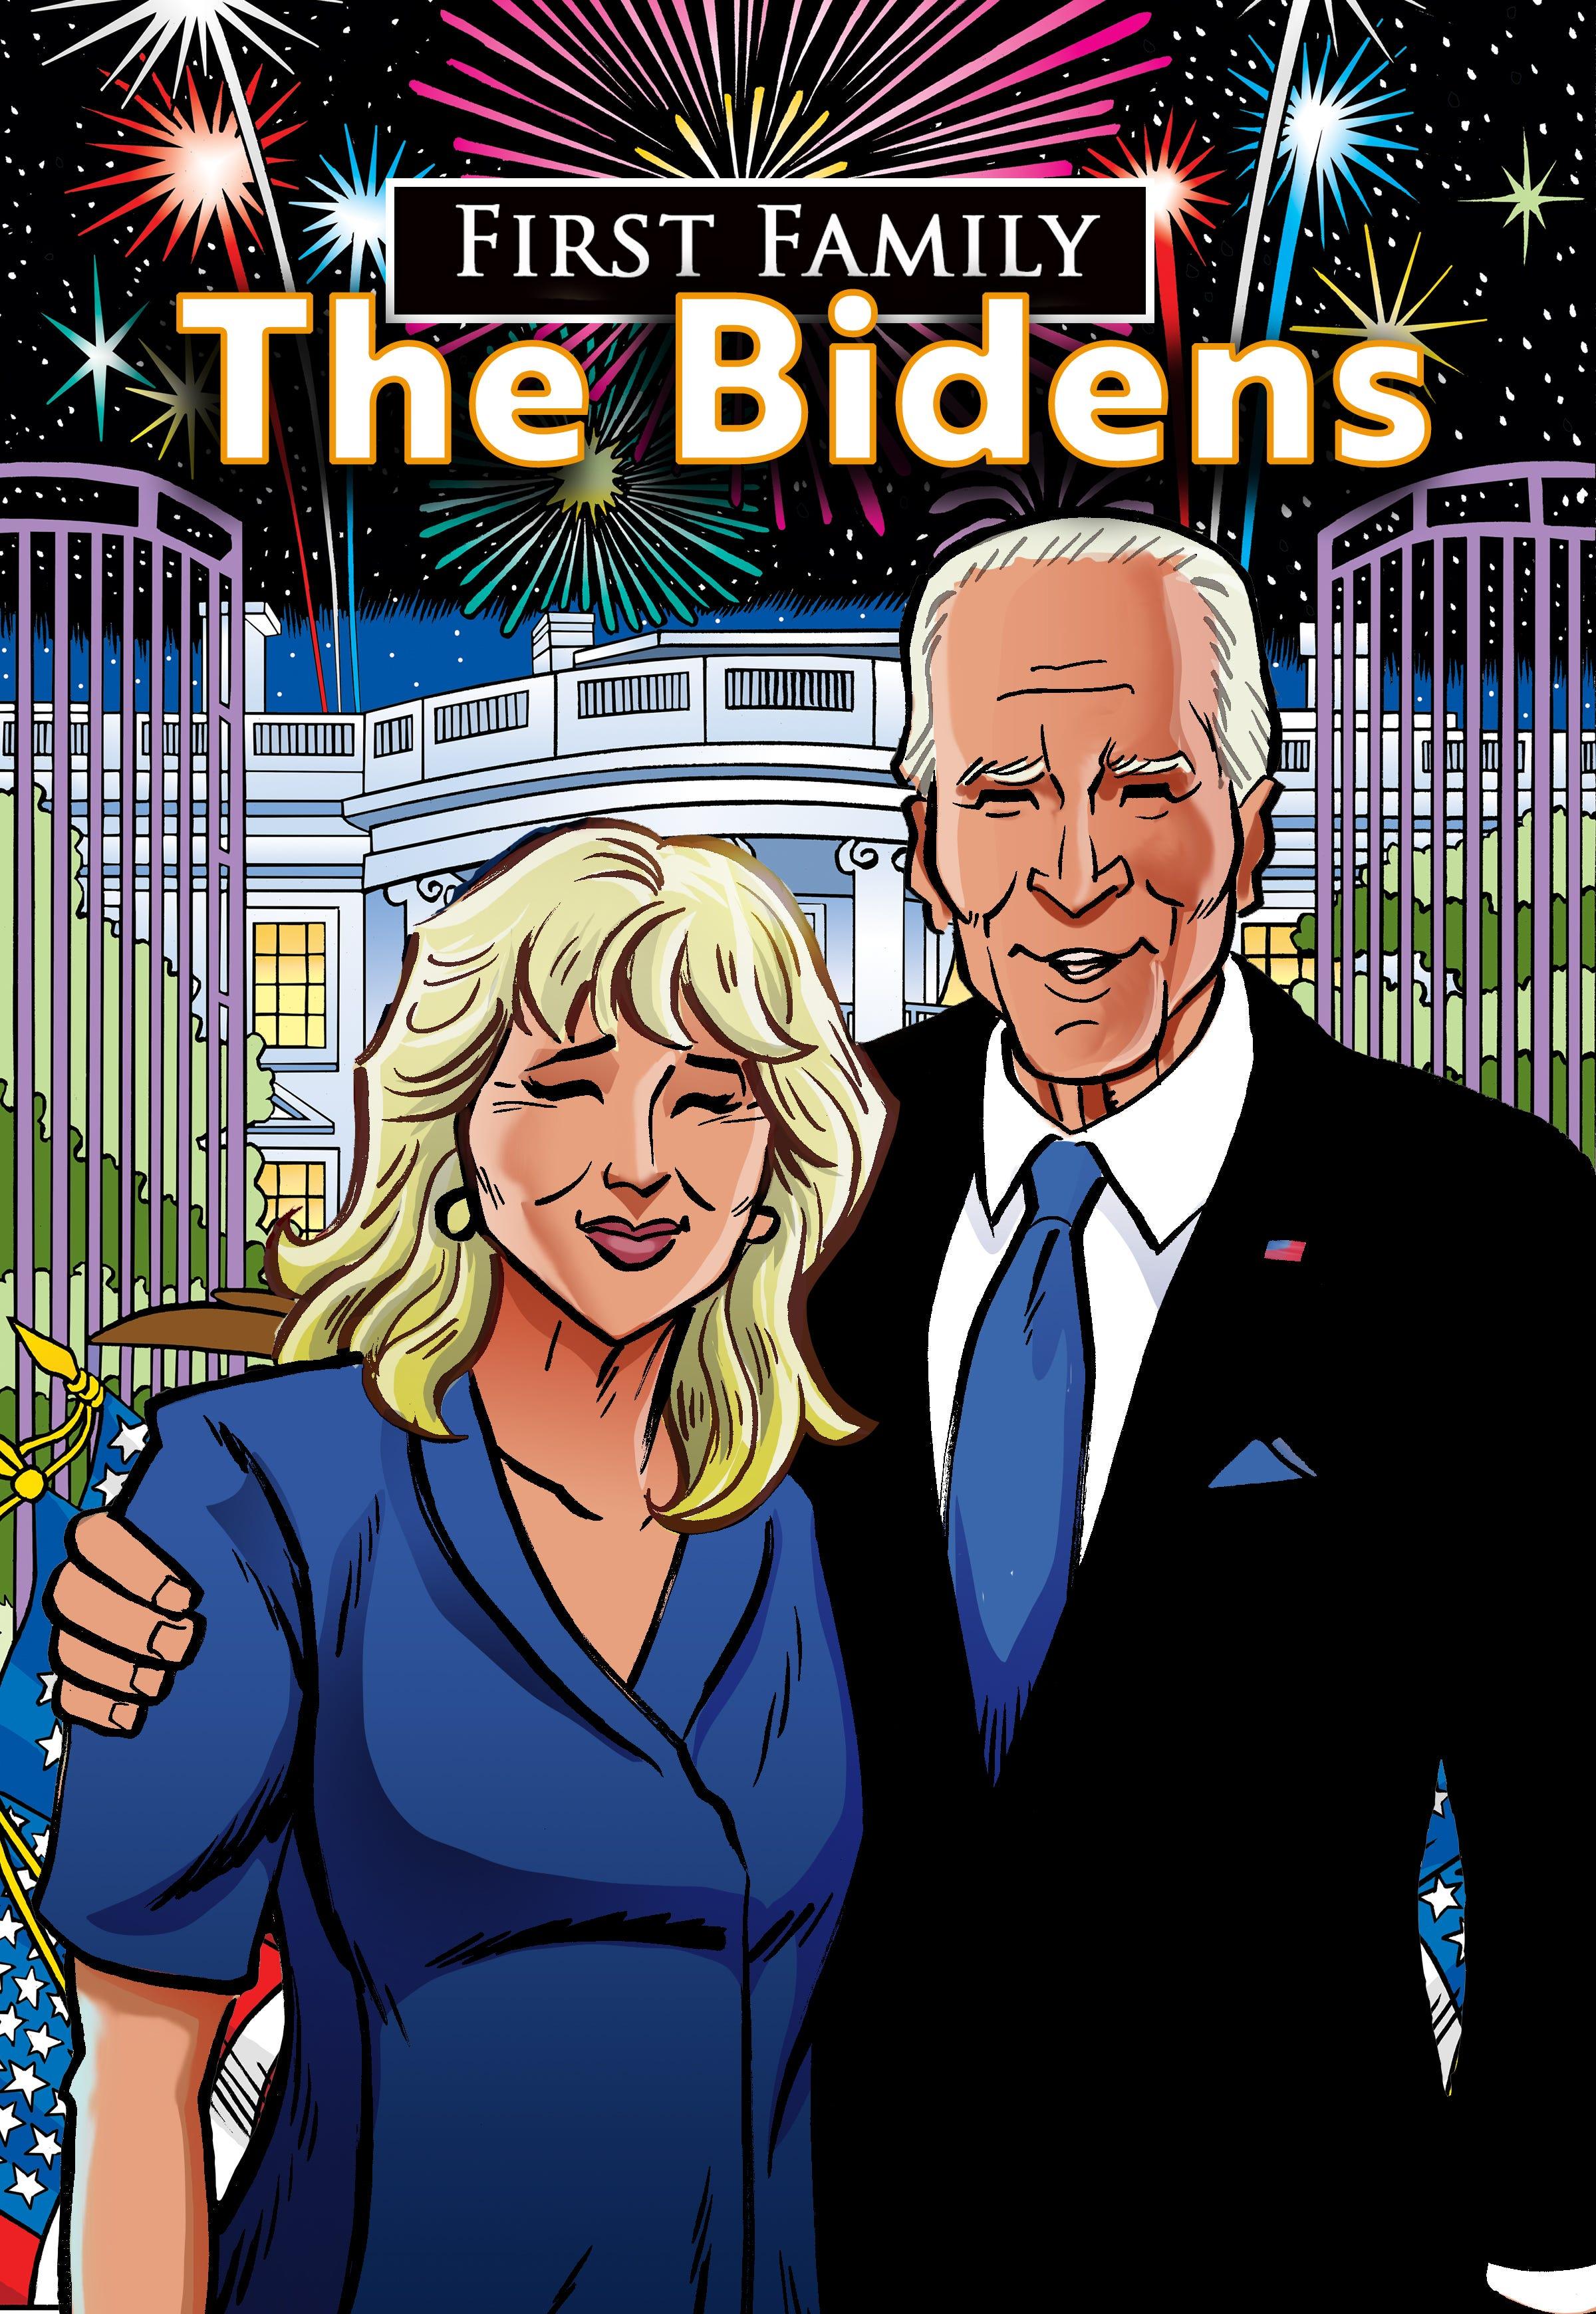 Joe and Jill Biden will get joint comic book,  First Family: The Bidens,  this fall